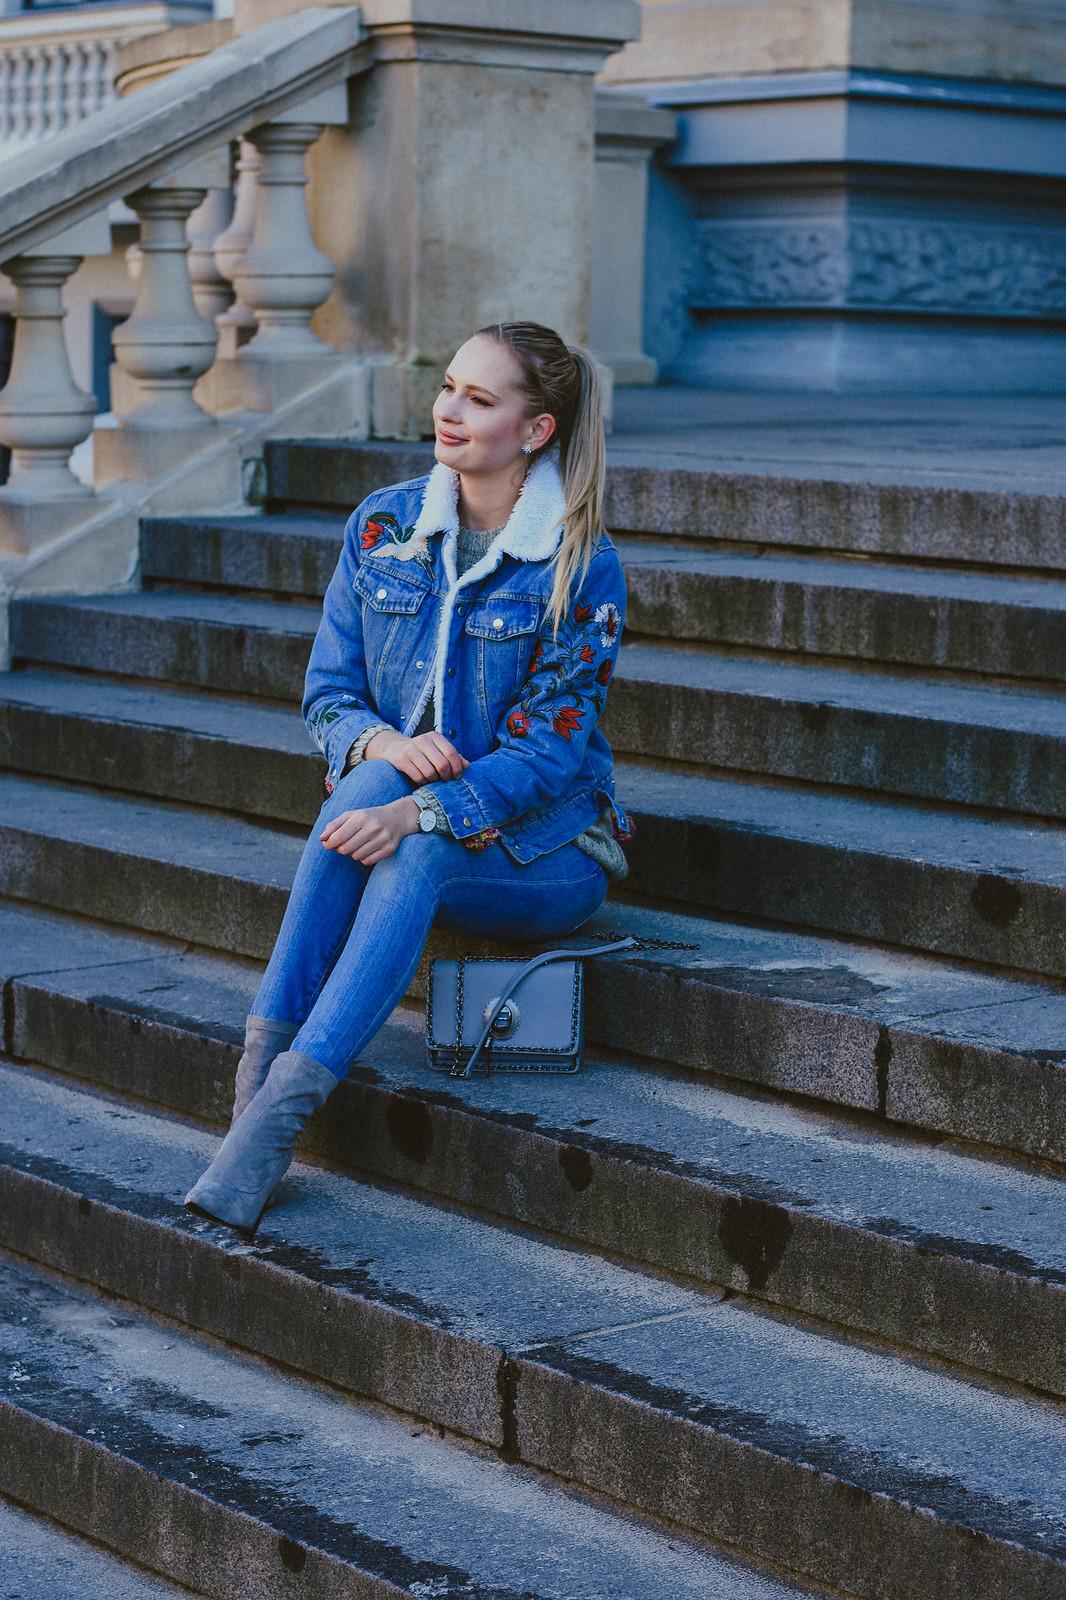 European fashion blogger